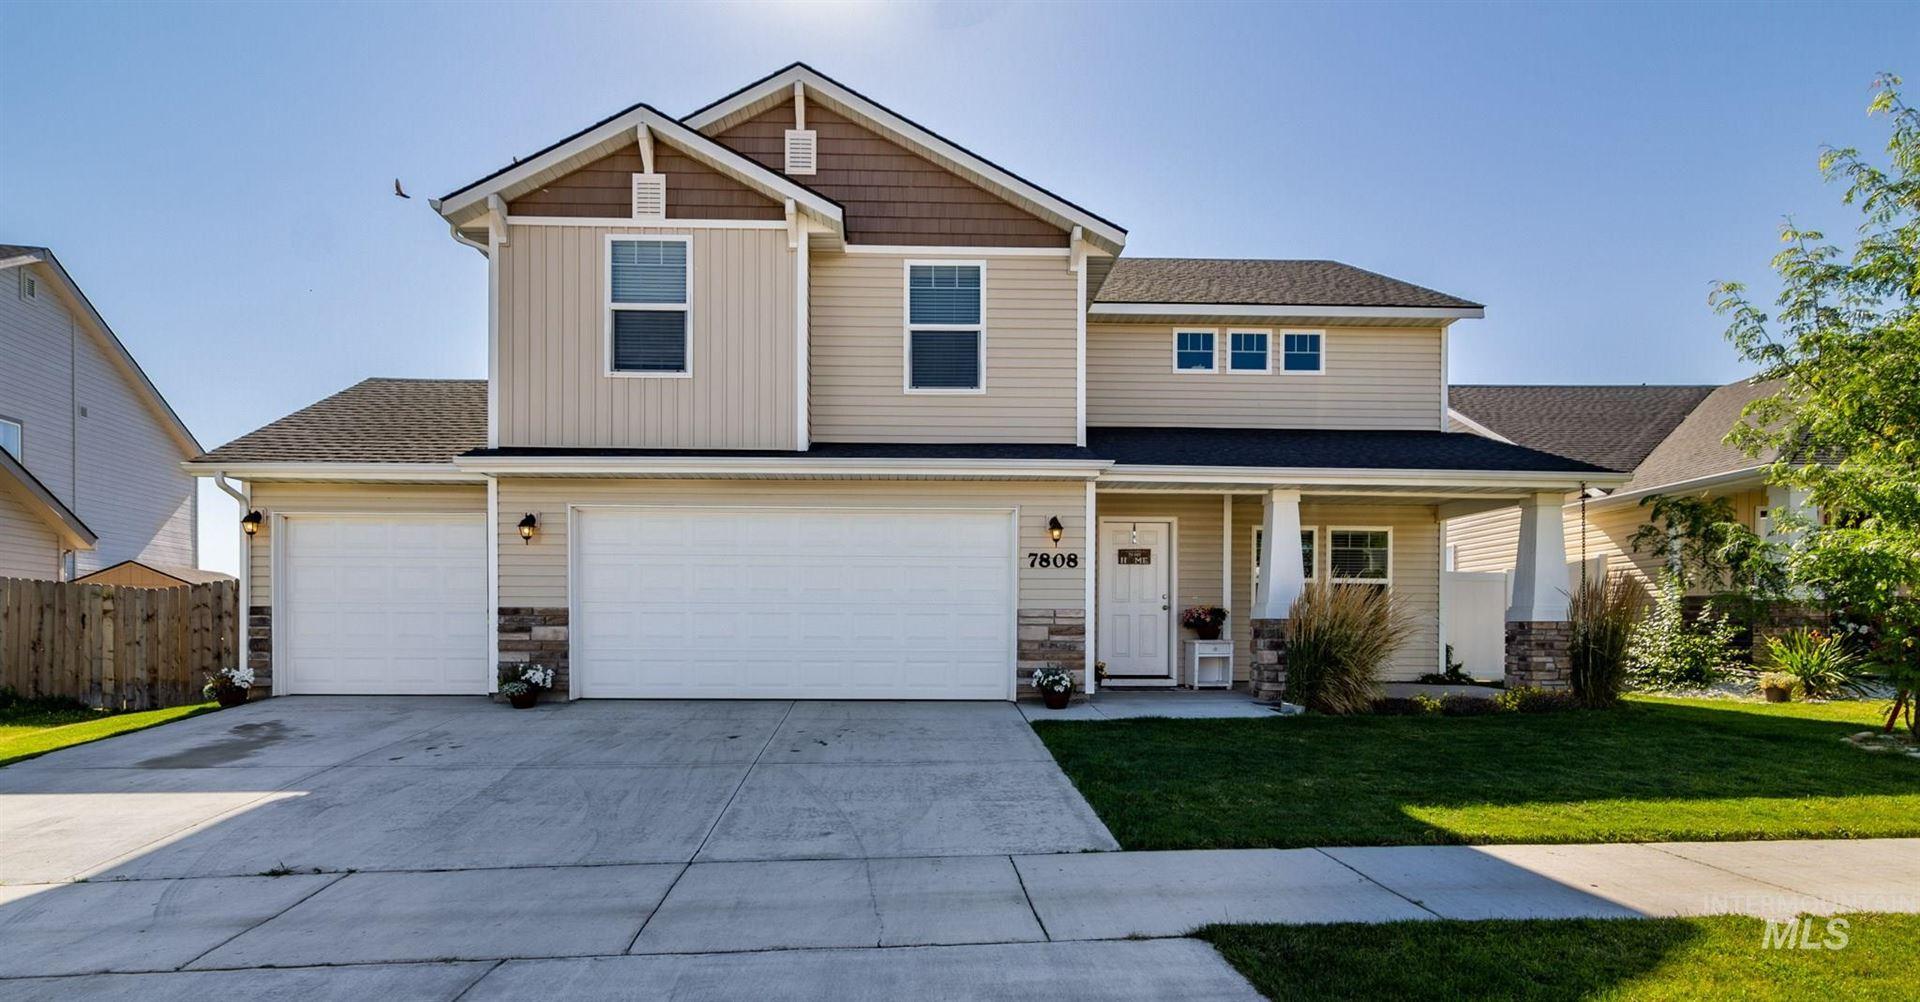 7808 S Cape View Way, Boise, ID 83709 - MLS#: 98774390